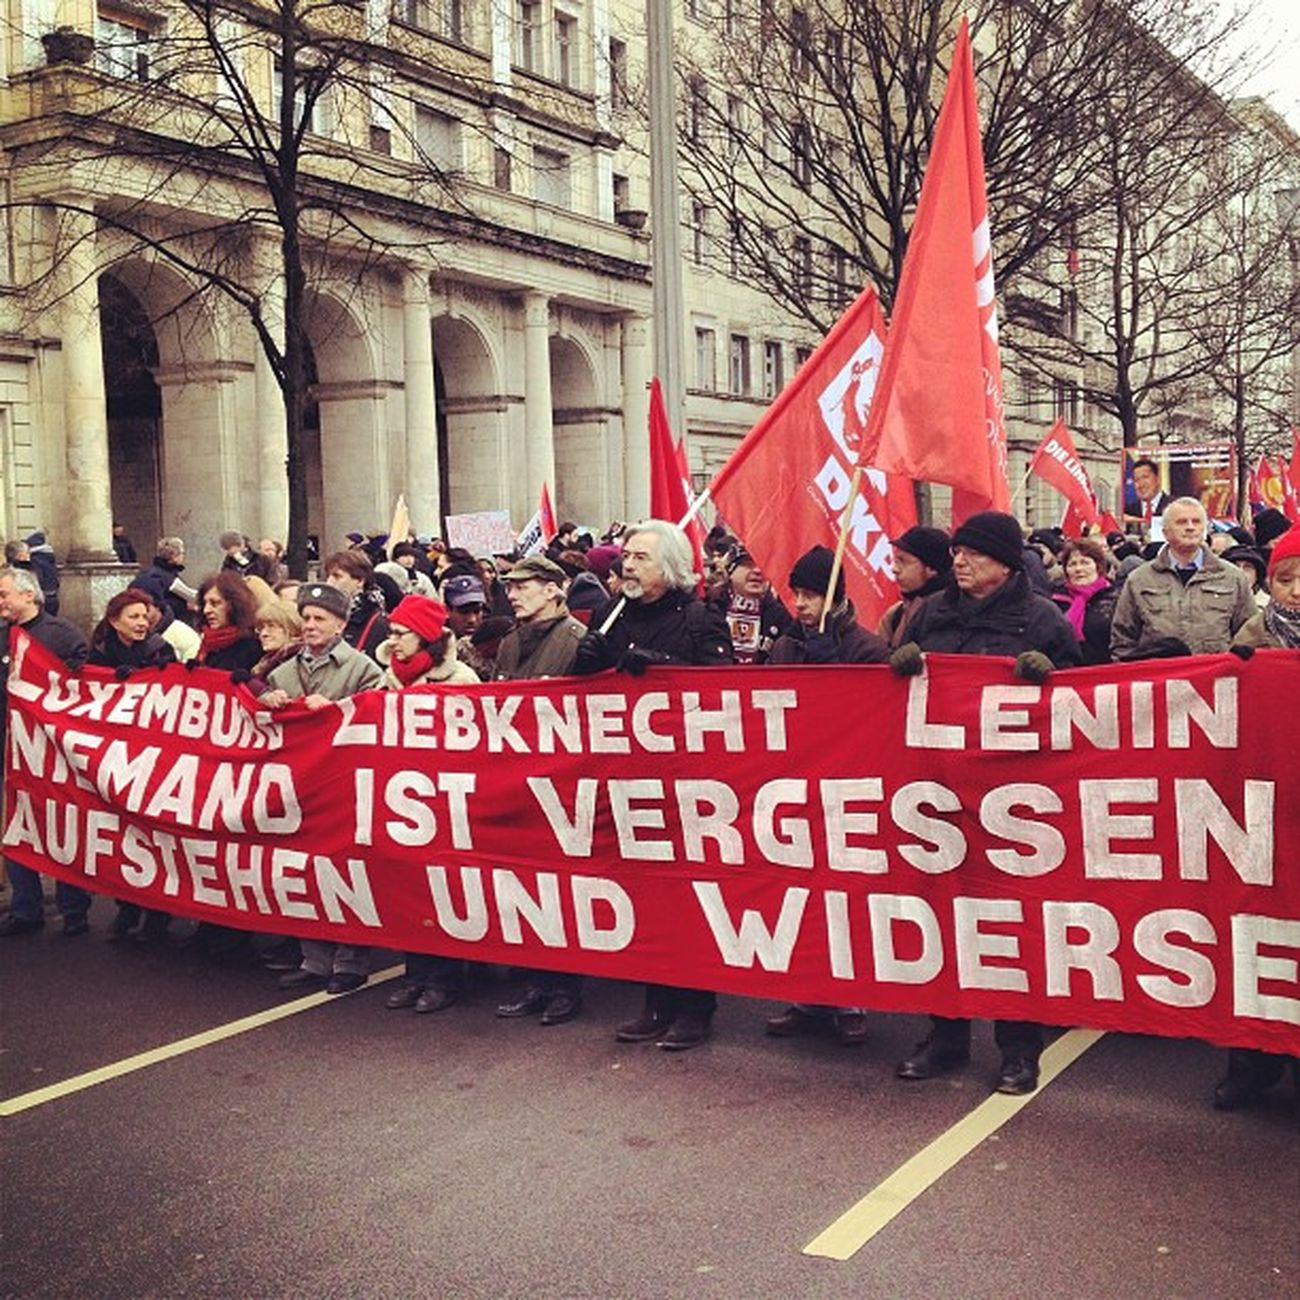 #igersberlin #instagood #tweegram #photooftheday #follow #instamod #igers #picoftheday #instragamhub #instadaily #insta_germany #bestoftheday #igdaily #websteagam #instragramers #ig_special #igersberlin #gf_germany #all_shots #berlin #germany #berlin #ros All_shots Karlliebknecht Bestoftheday Rosaluxemburg Igers Kommunismus IGDaily Tweegram Instagood Instadaily Igersberlin Berlin Insta_germany Demo Fhain Germany Gf_germany Photooftheday Instragramers Demonstration Ig_special Picoftheday Instragamhub Friedrichshain Instamod Follow Websteagam